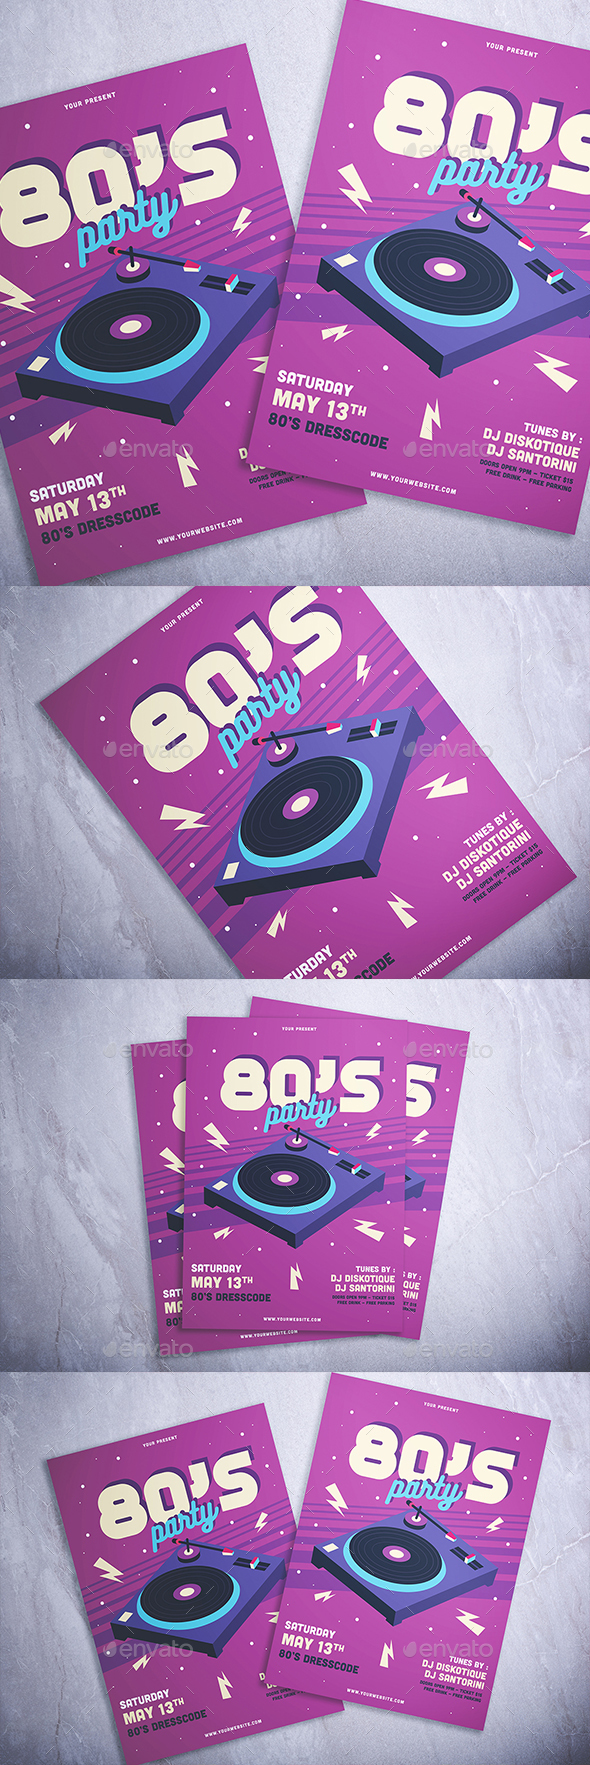 80's Party Flyer - Flyers Print Templates